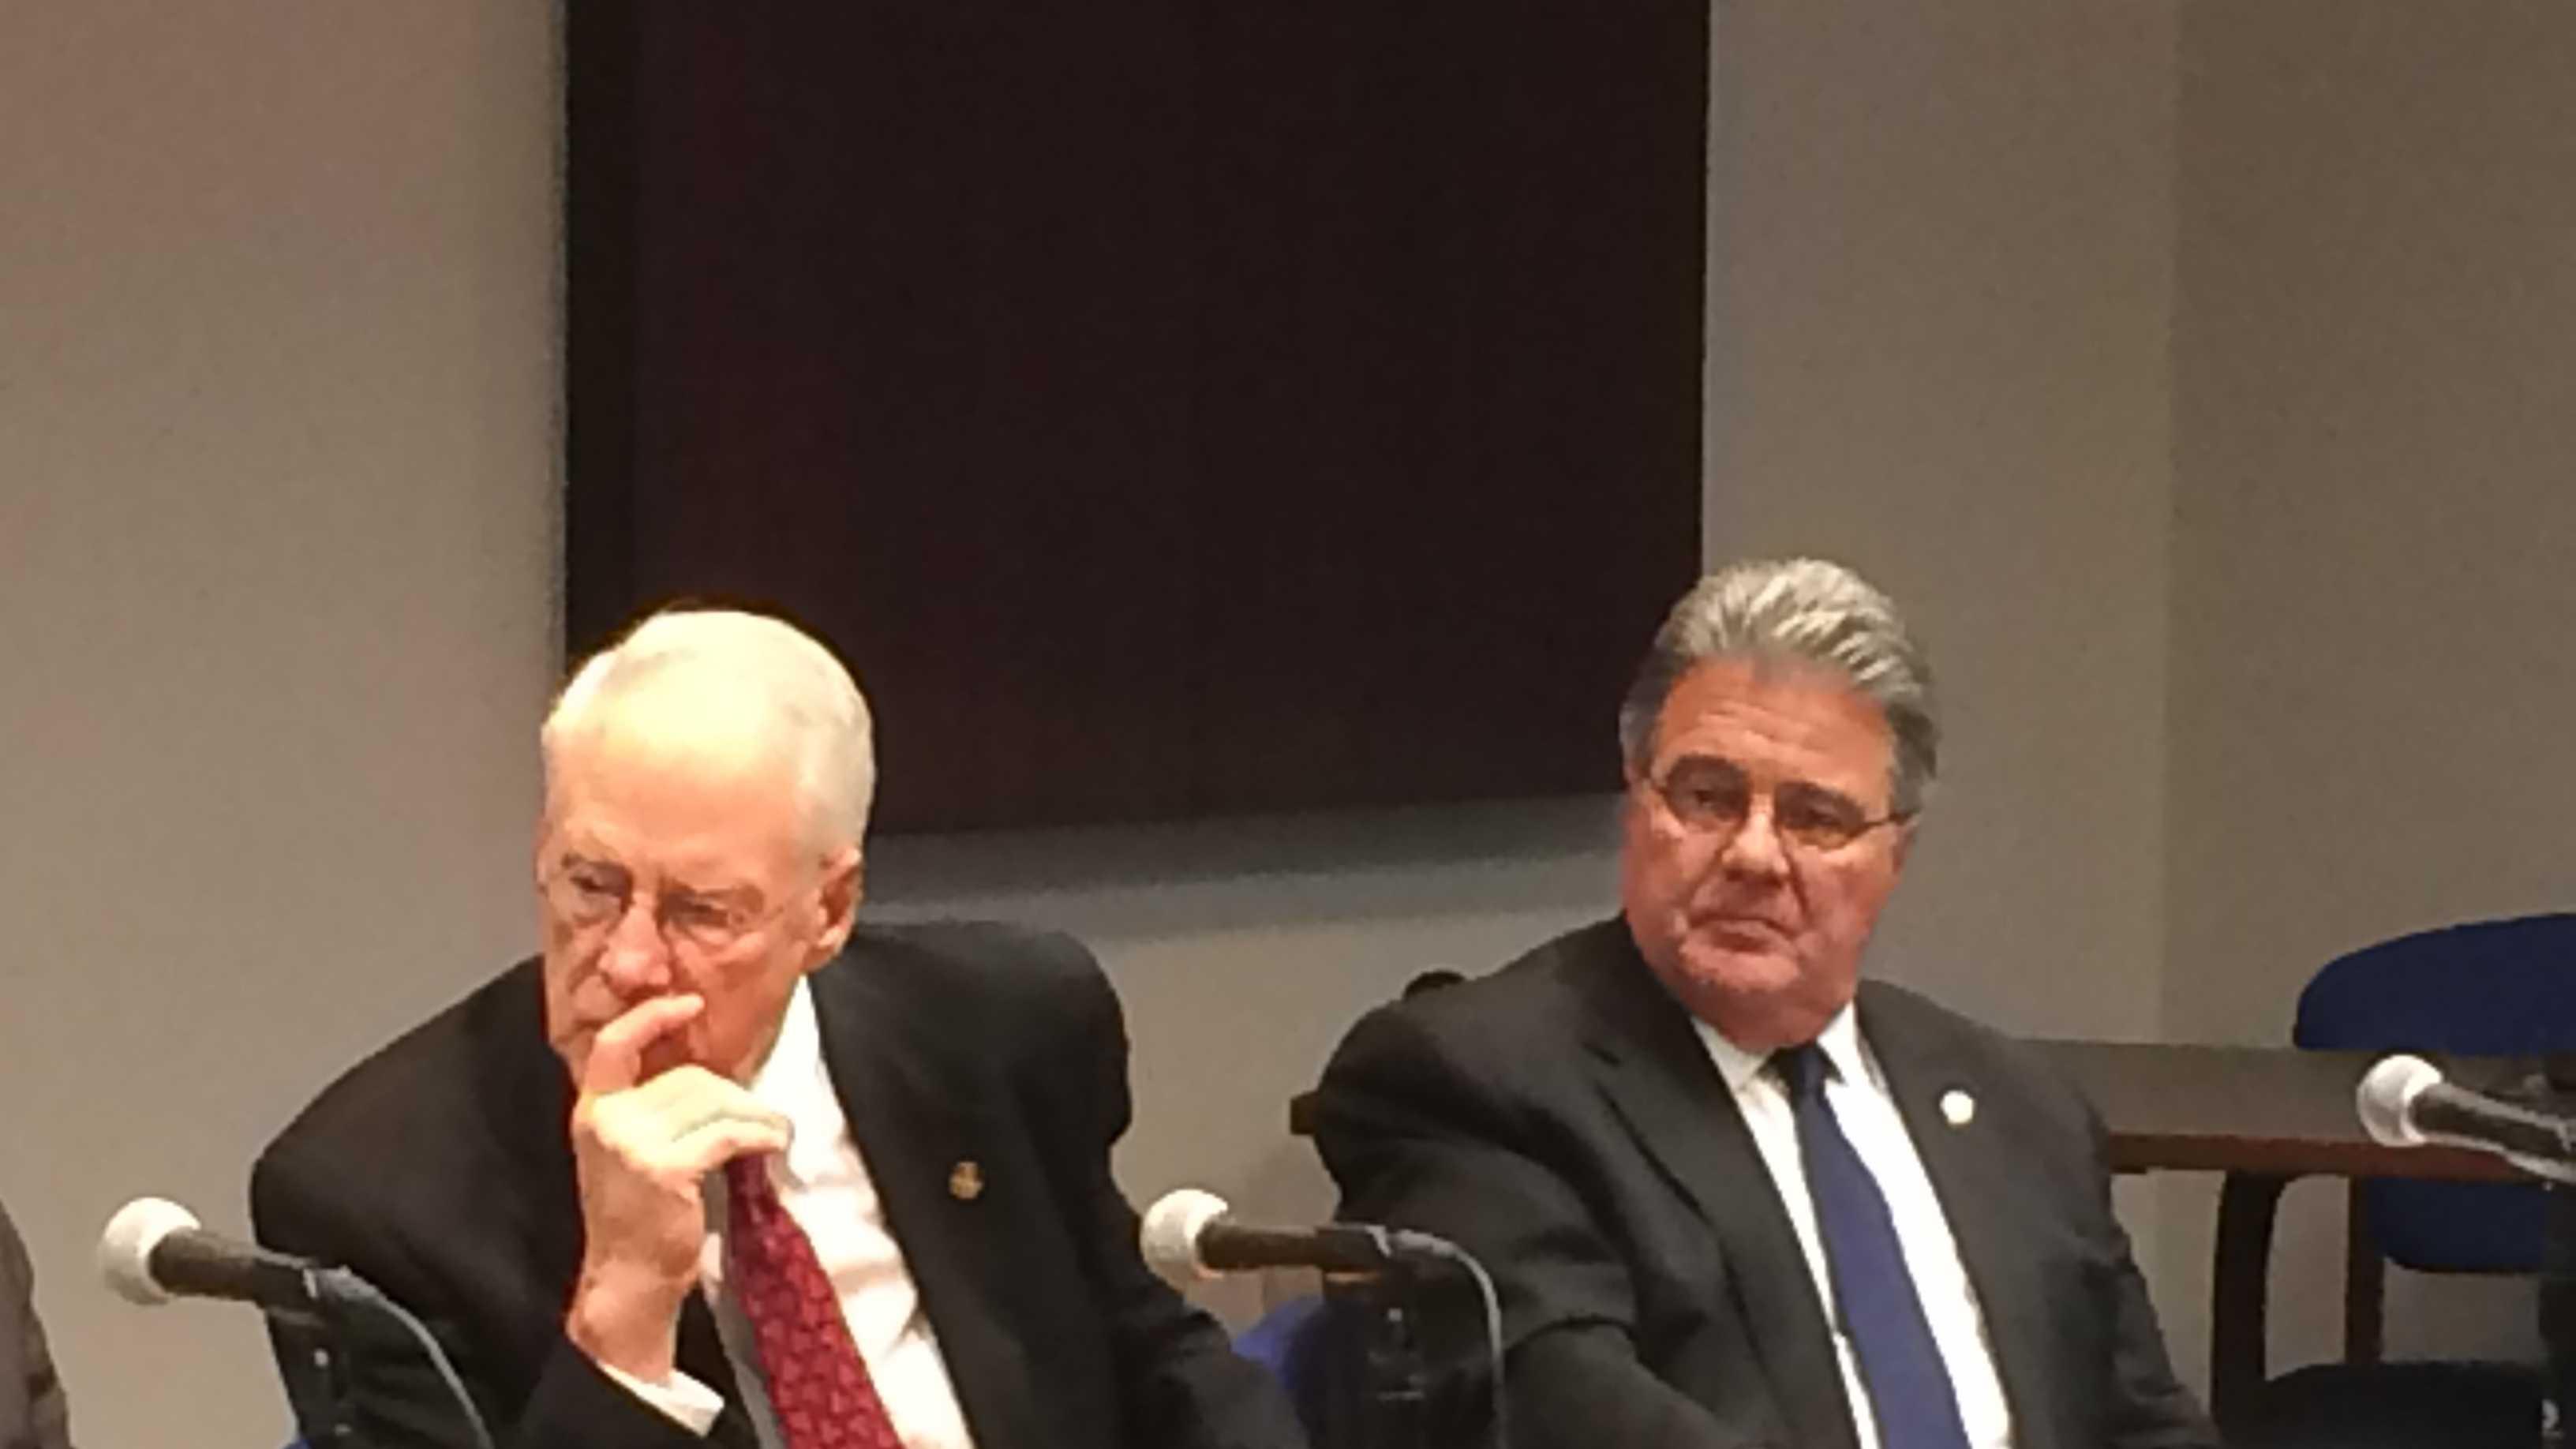 Outgoing USM Chancellor William Kirwan, (left), incoming USM Chancellor Robert Caret (right)